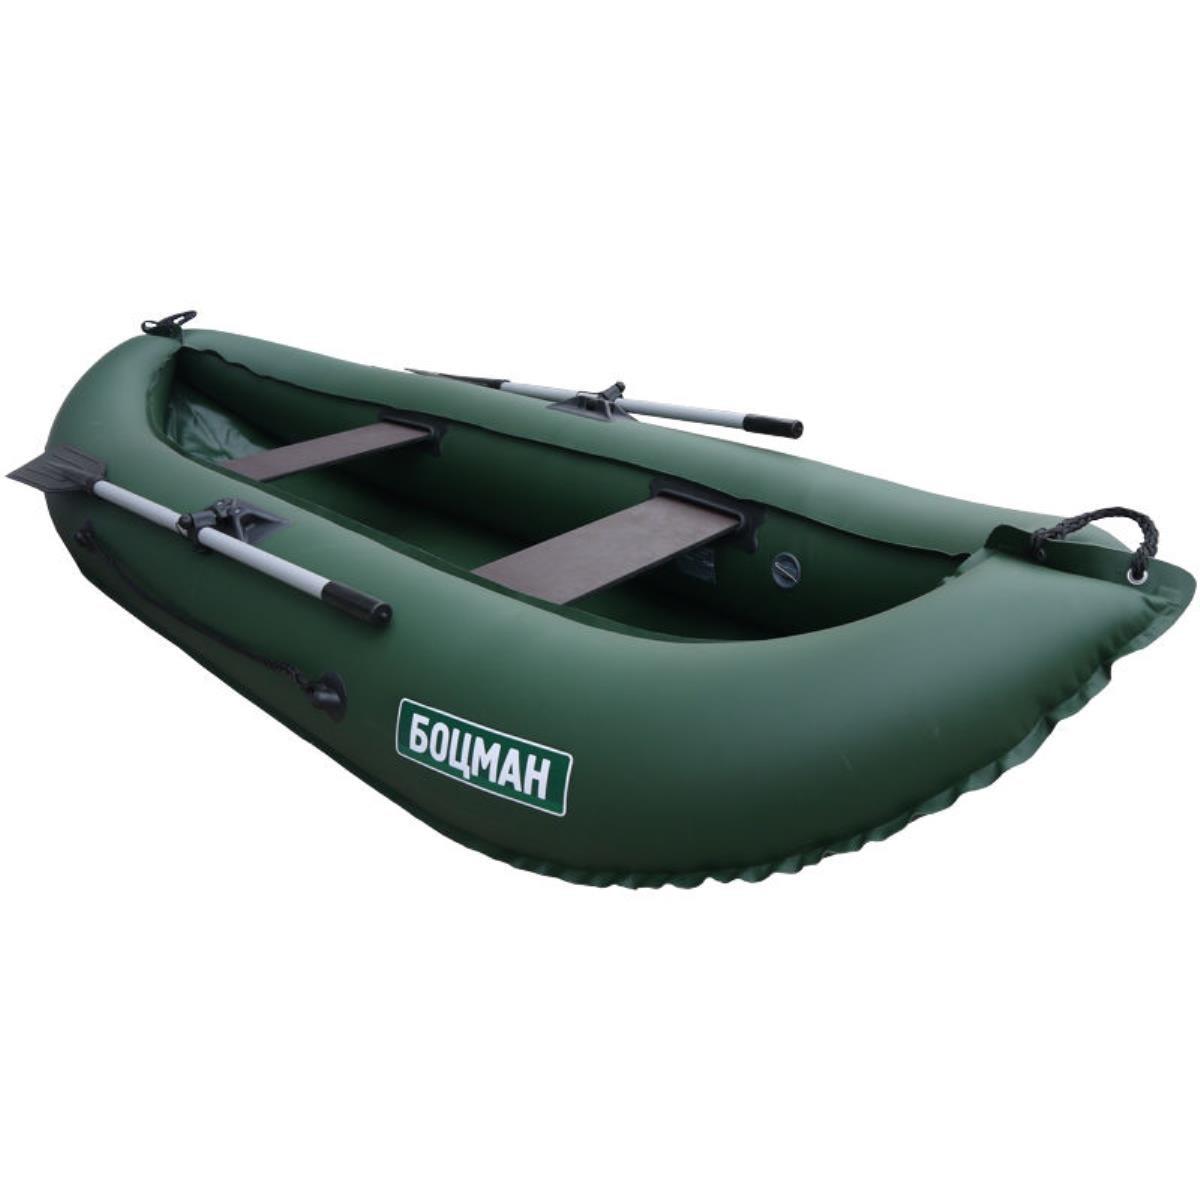 Boat Botsman (green)/boat Botsman 270n (green)